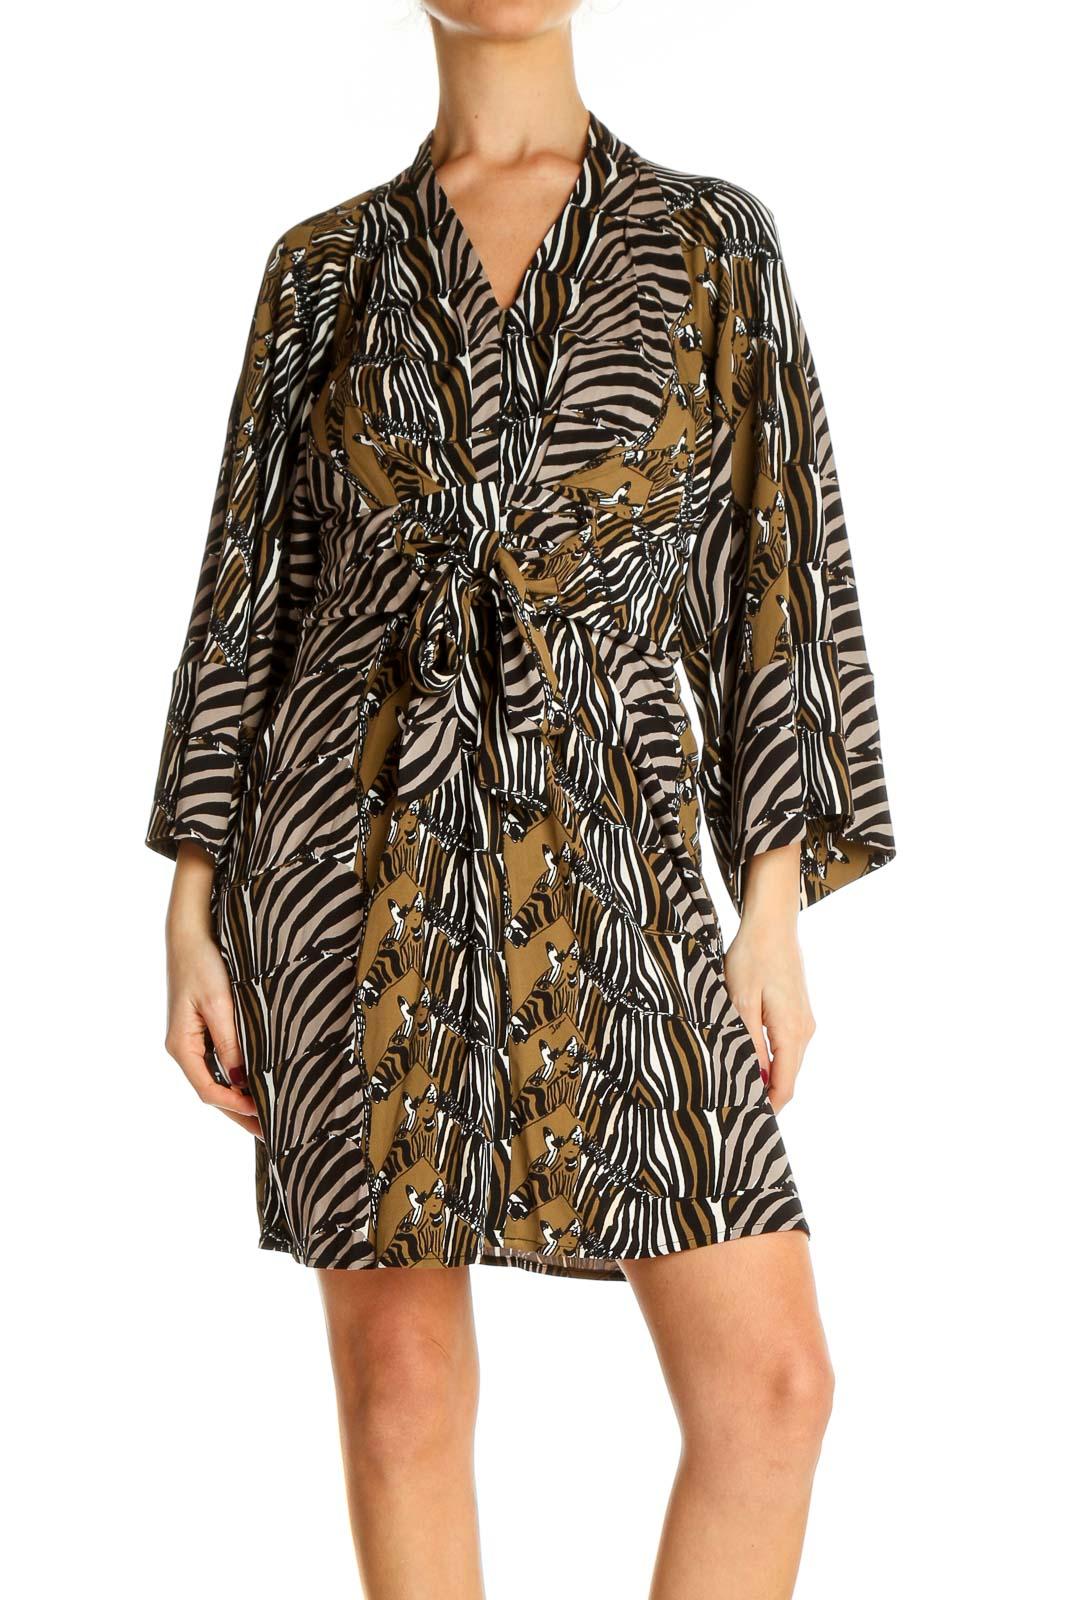 Black Animal Print Day Sheath Dress Front